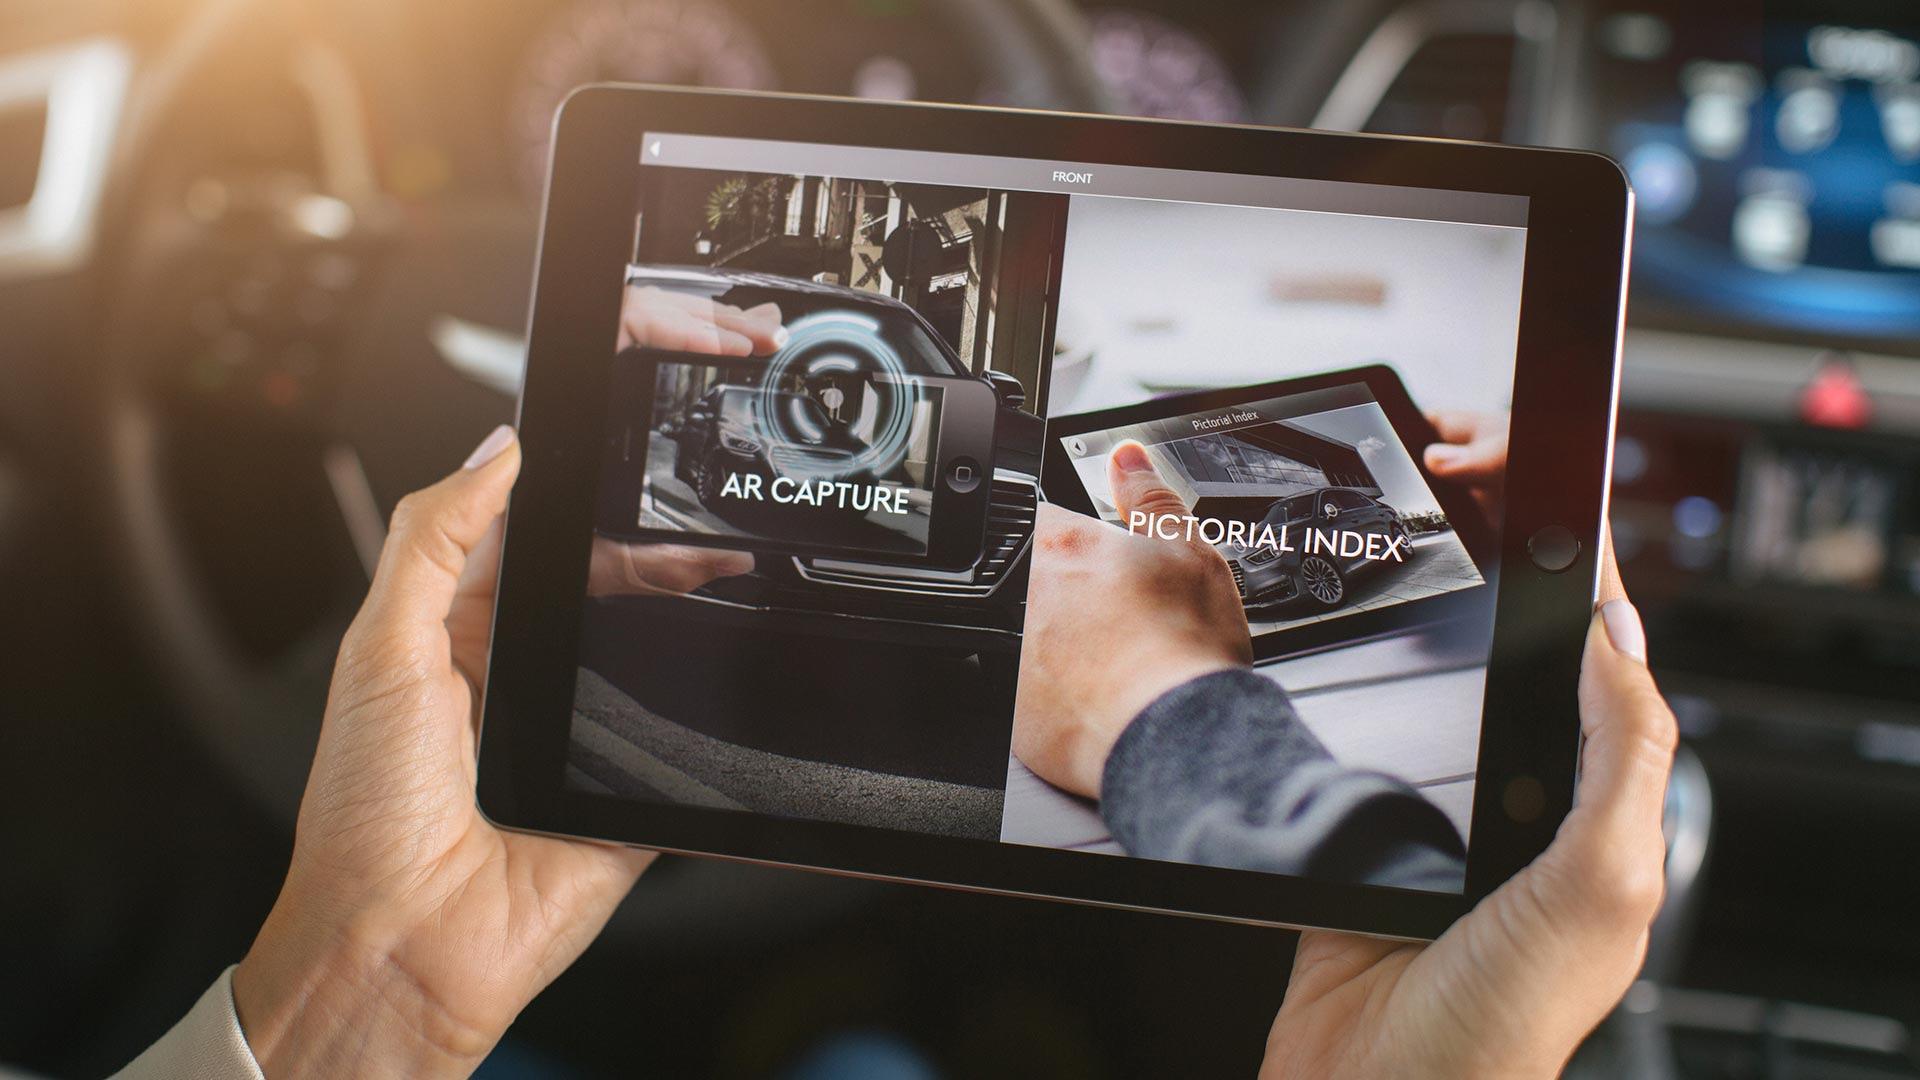 genesis-virtual-guide-app (3)